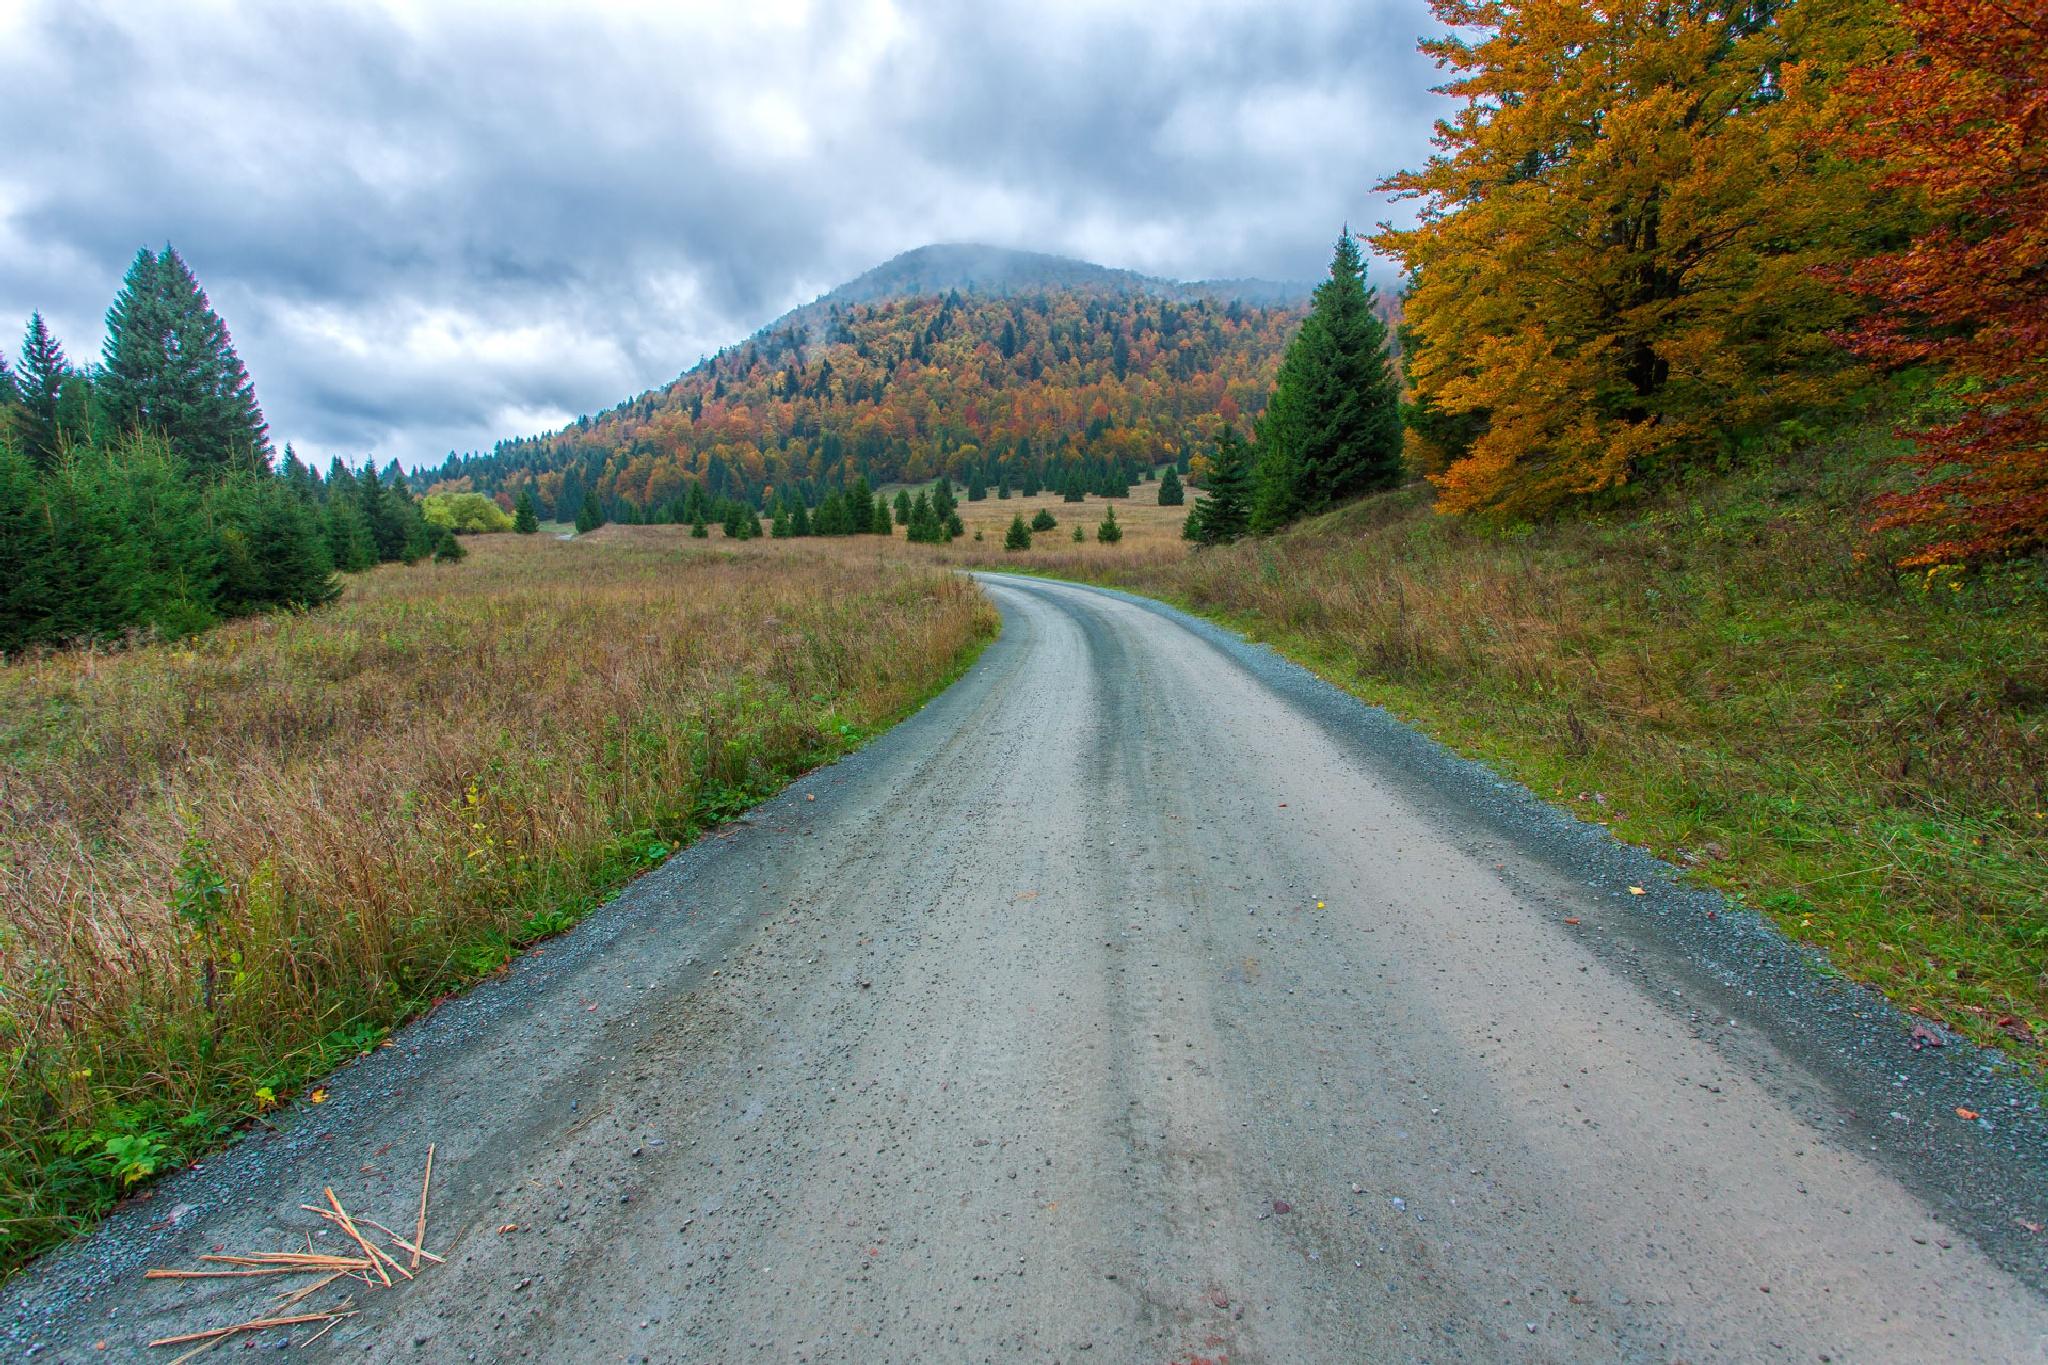 Golden road by stanislav.horacek2